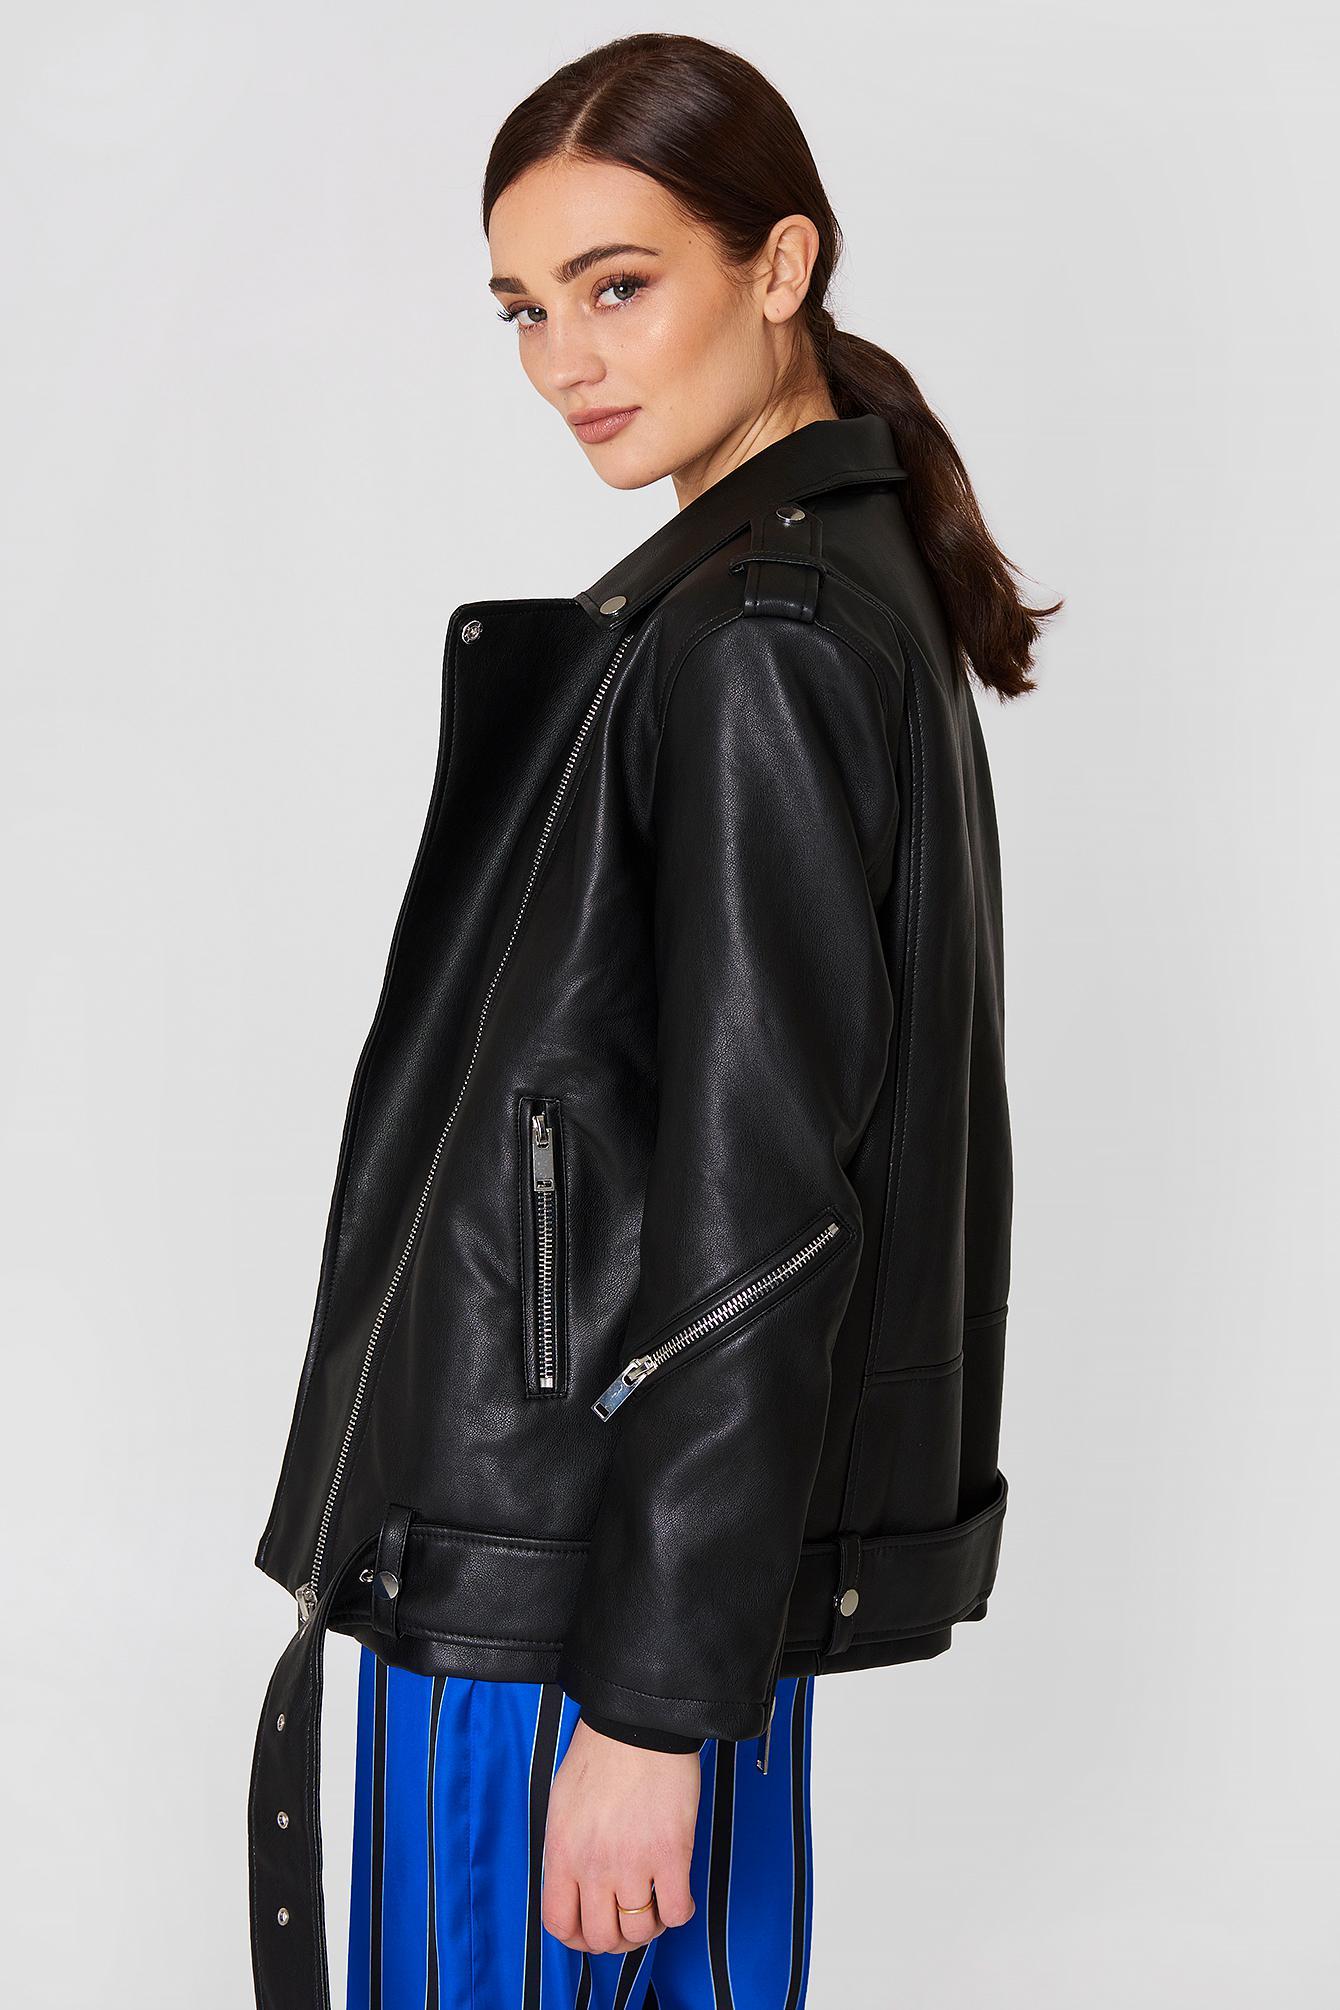 fashionable and attractive package yet not vulgar san francisco Mango Biker Oversize Jacket Black